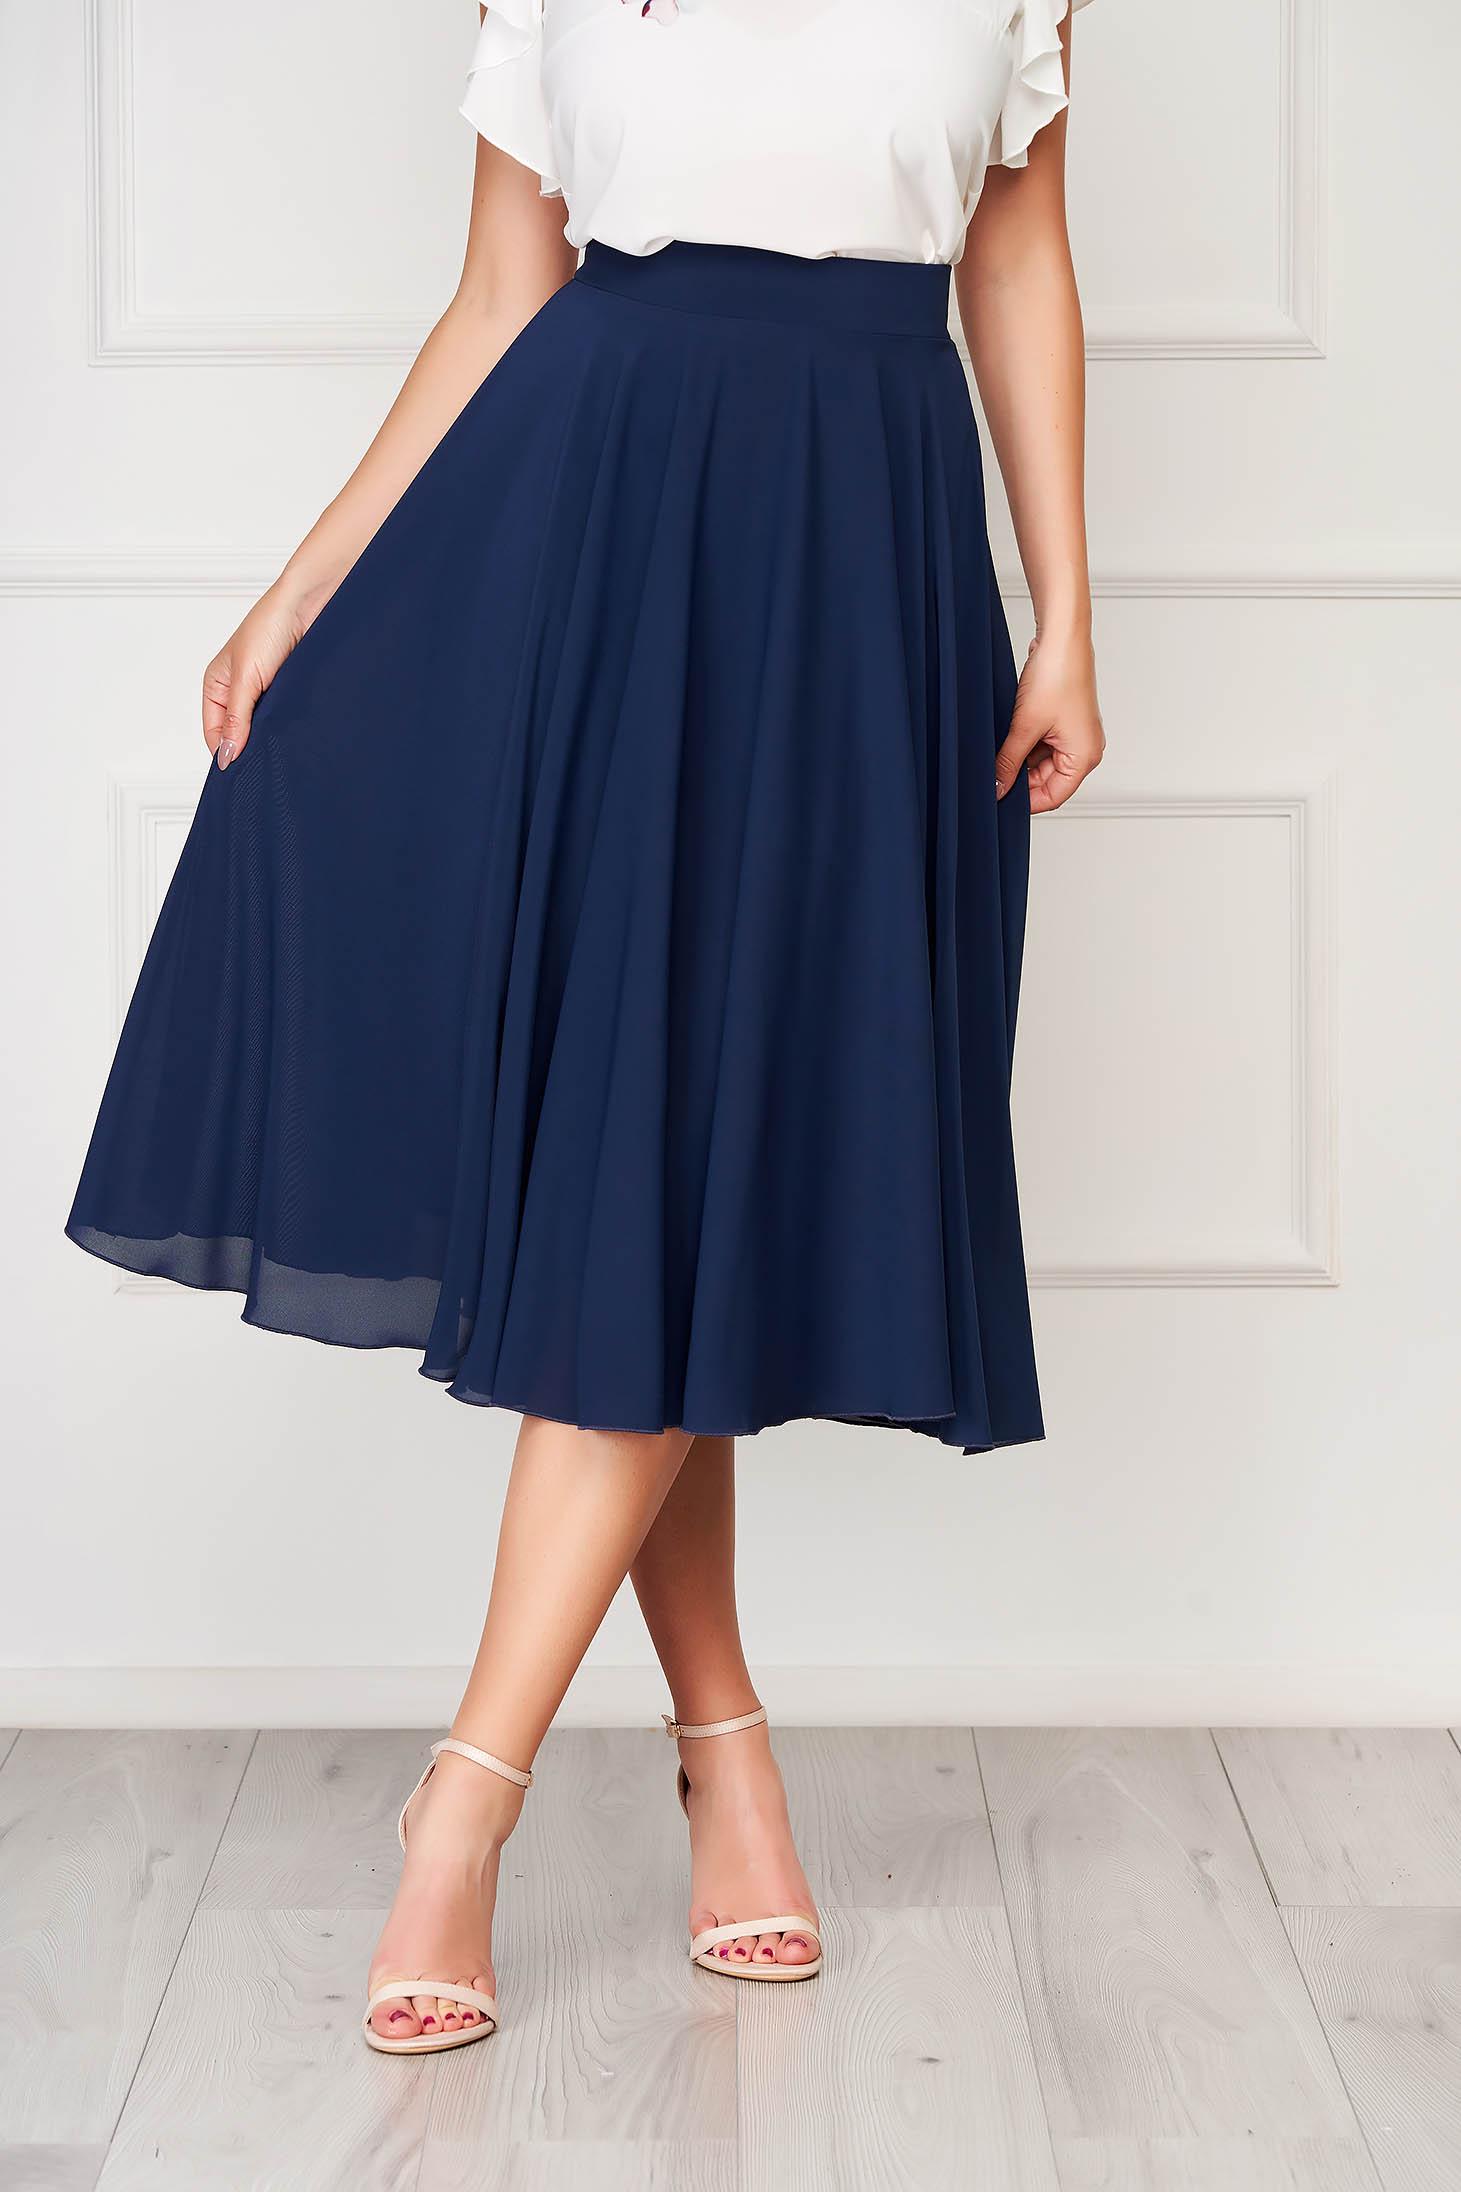 StarShinerS darkblue skirt elegant midi cloche from veil fabric high waisted